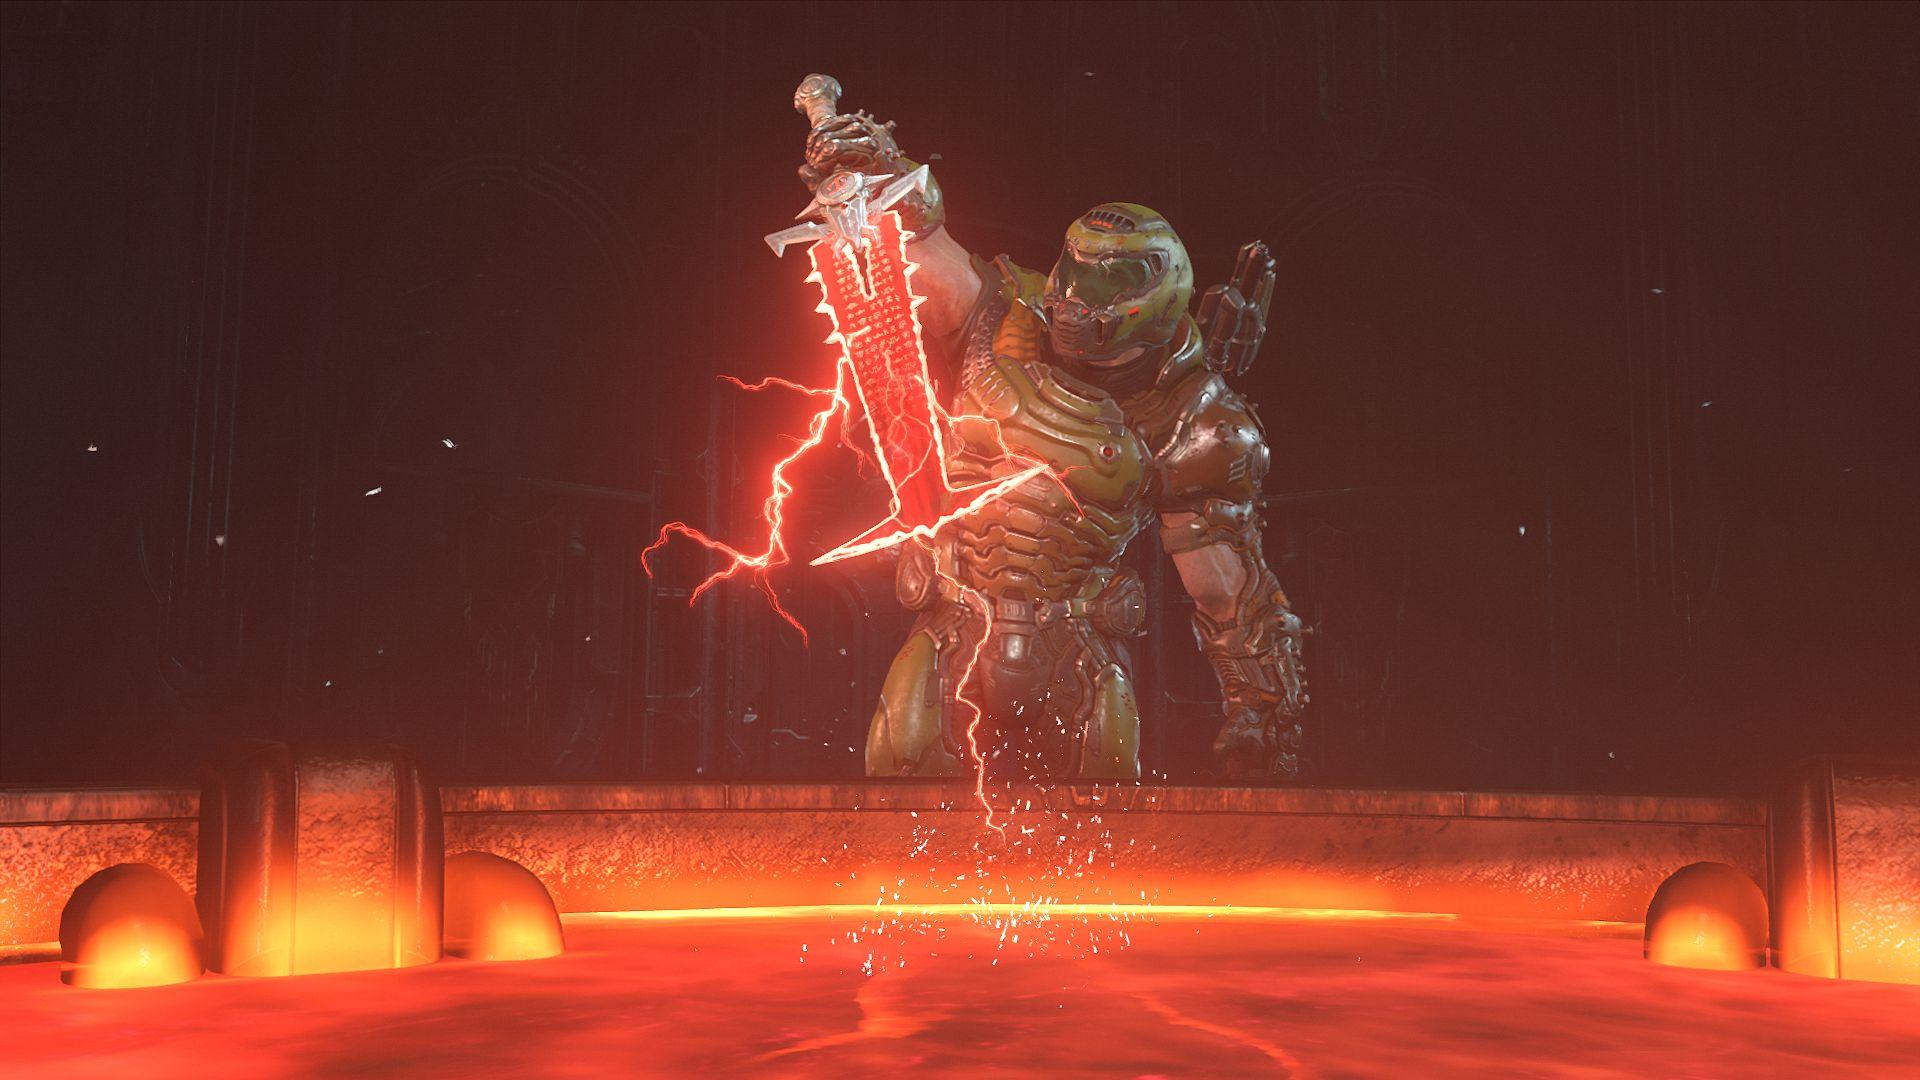 000106.Jpg - Doom Eternal